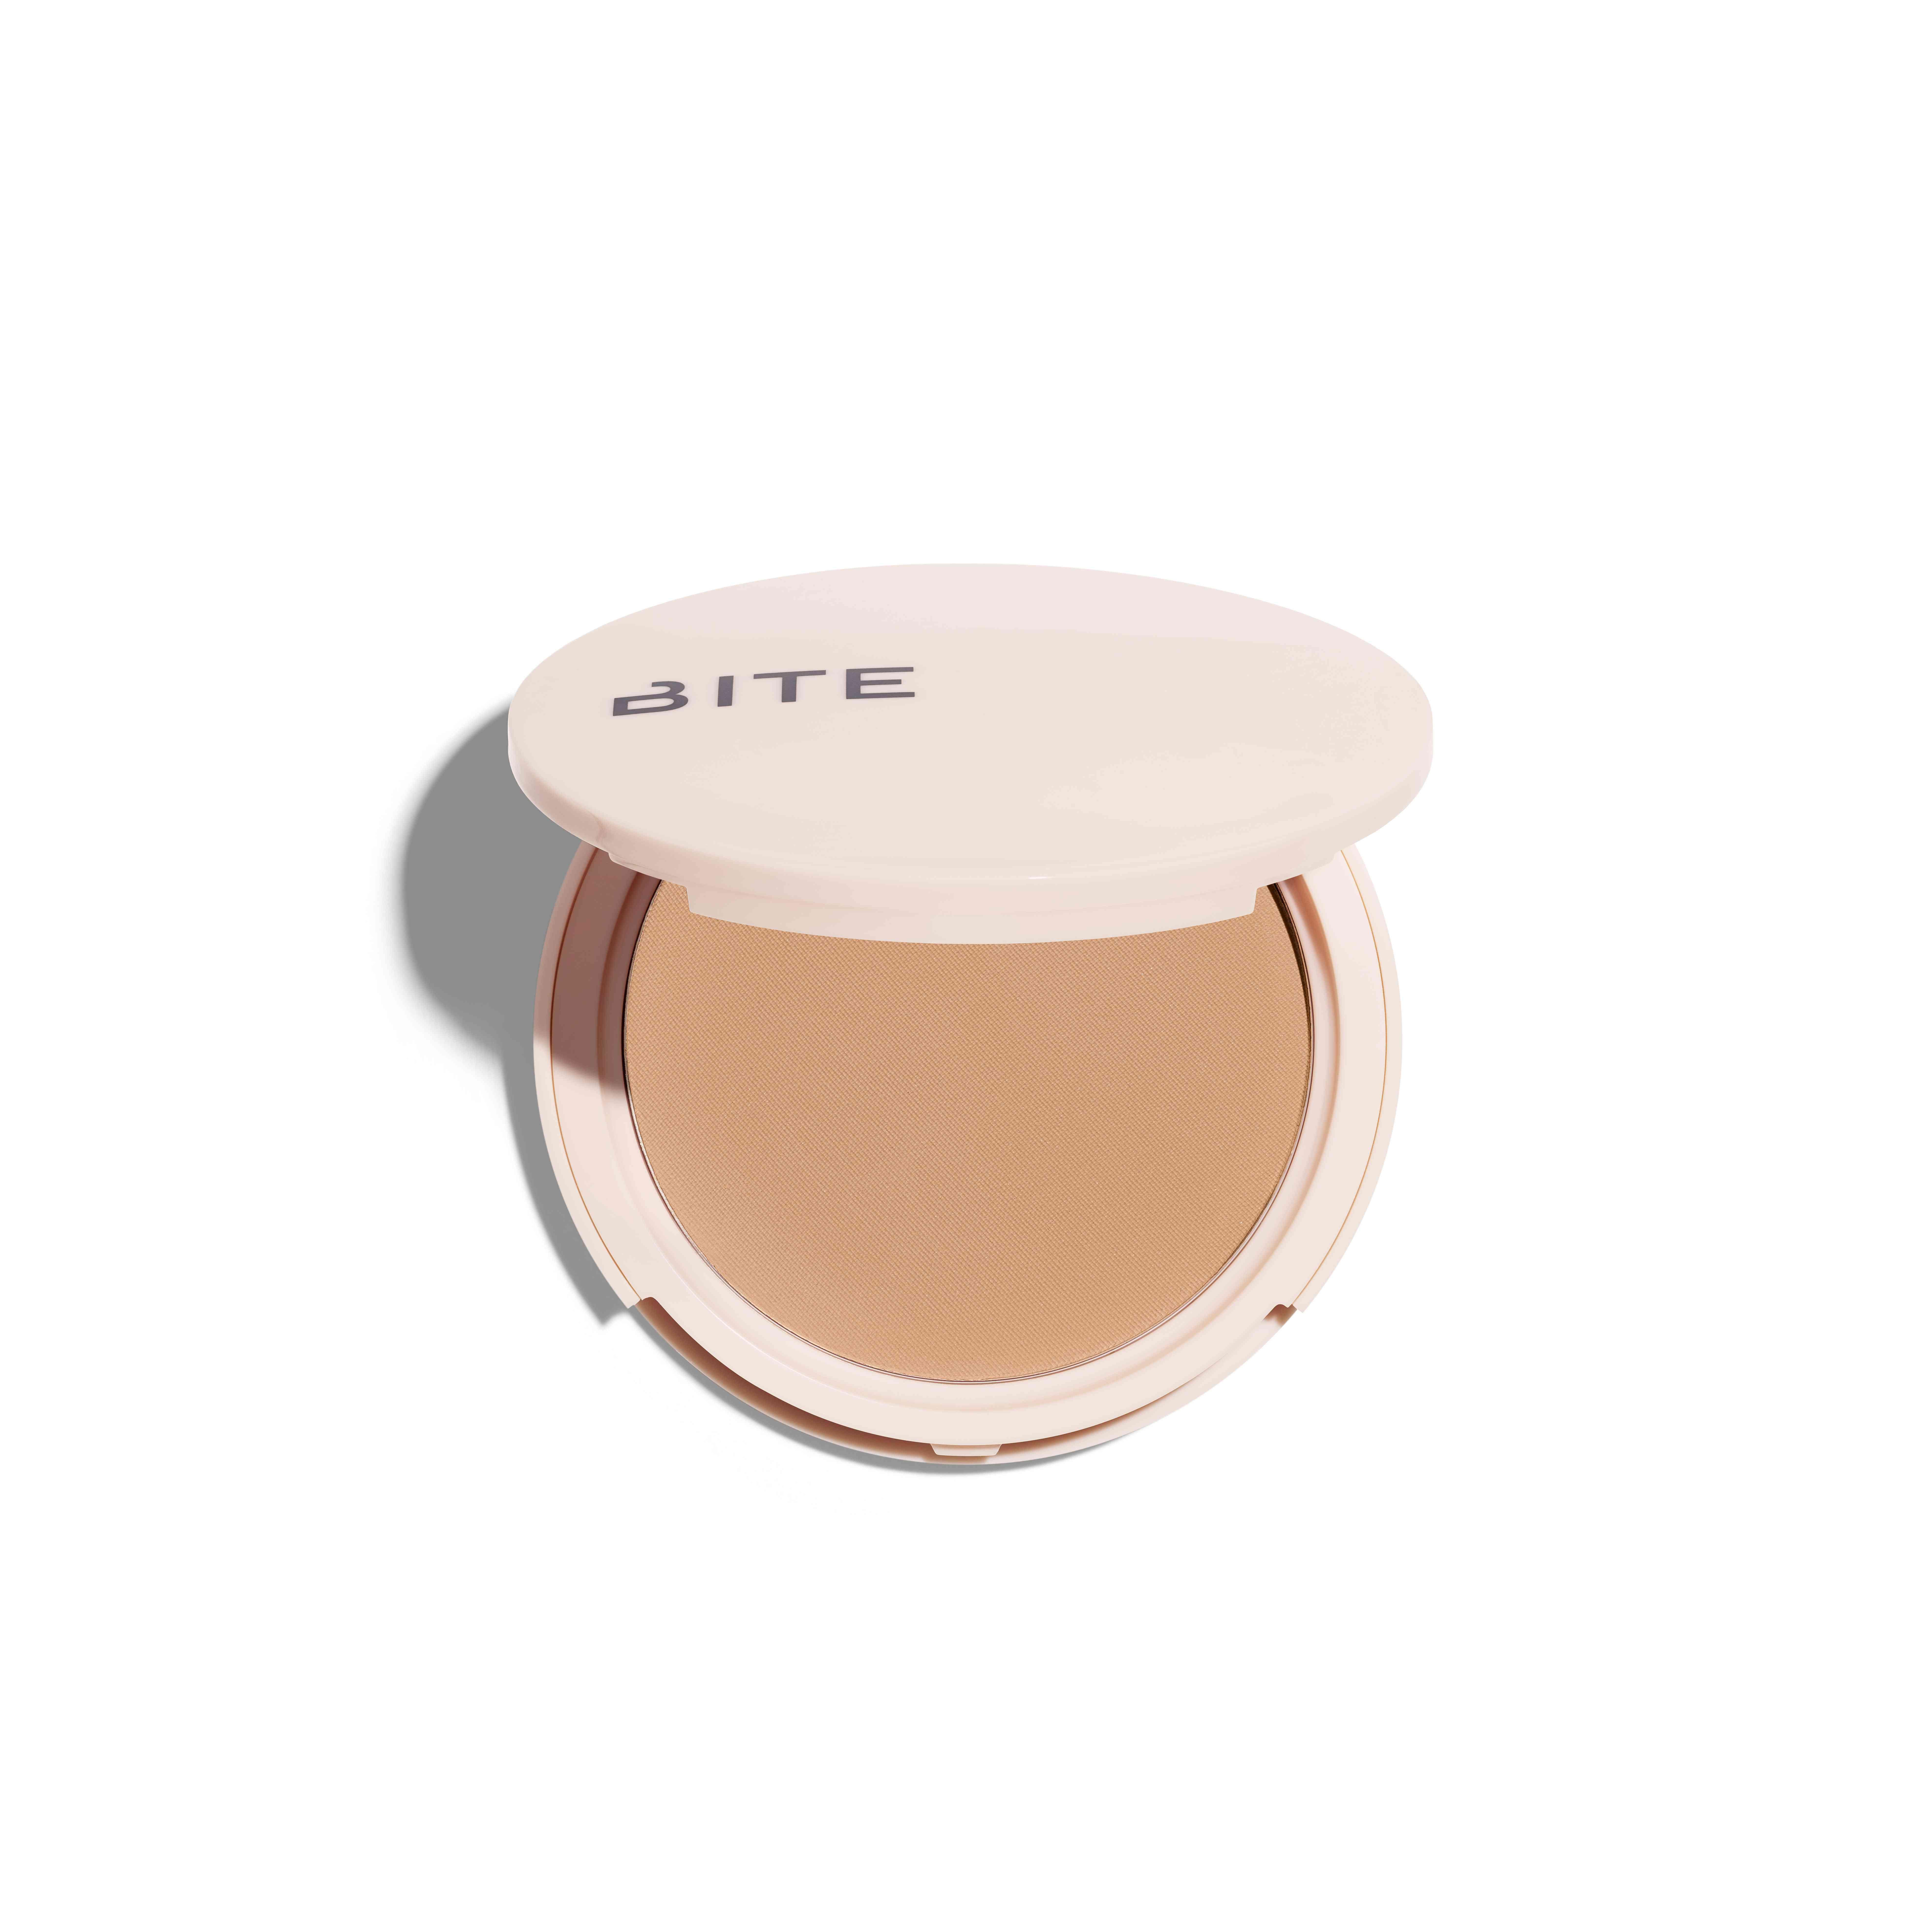 bite beauty changemaker foundation